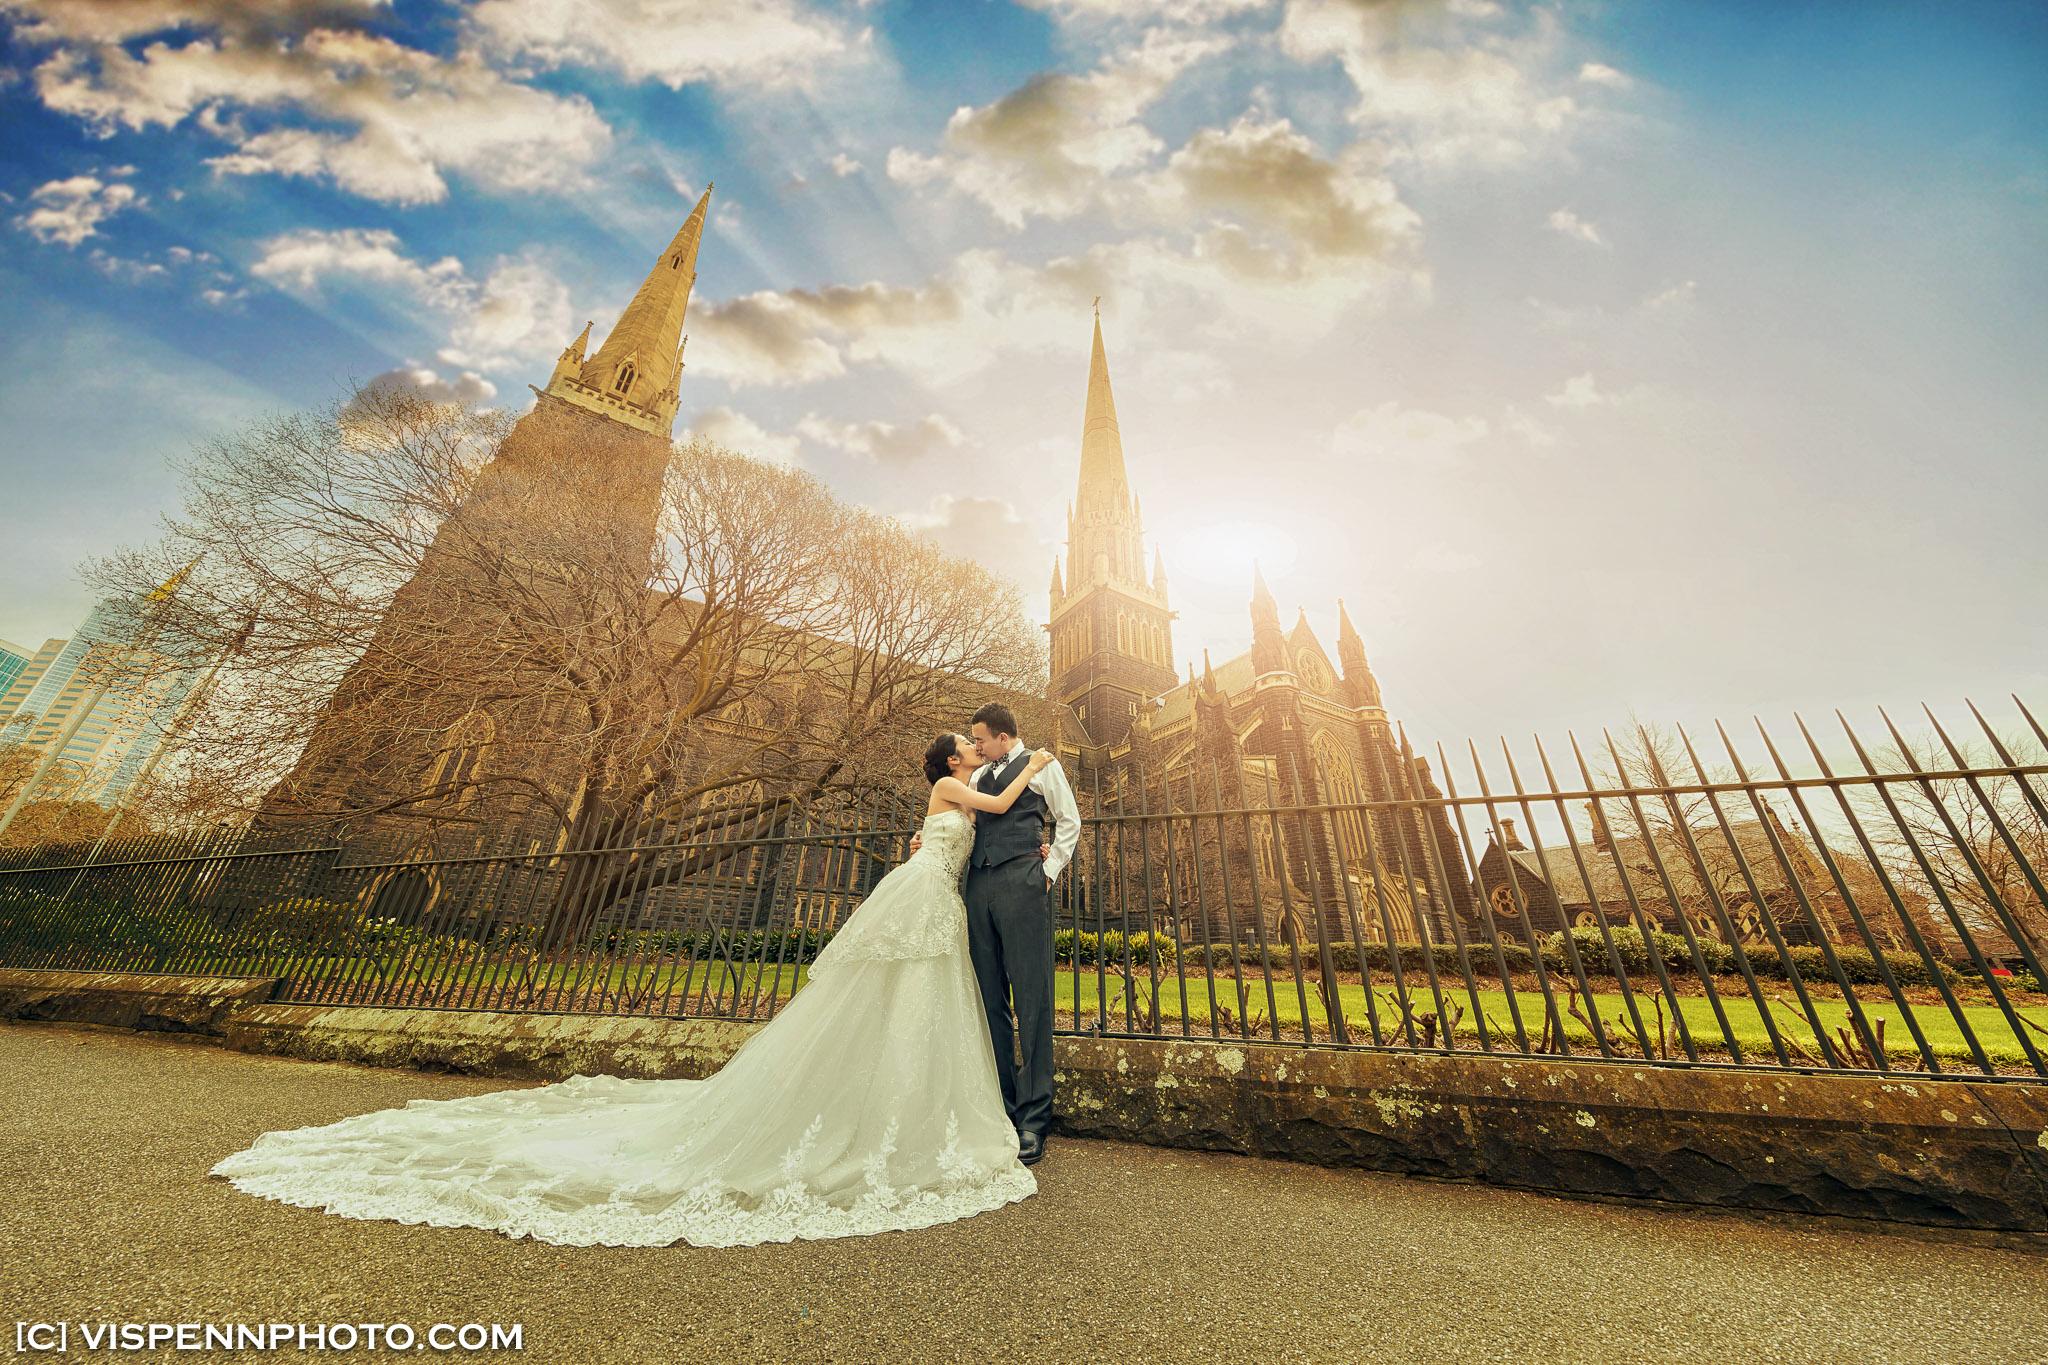 PRE WEDDING Photography Melbourne ZHPENN XXD 2174 1